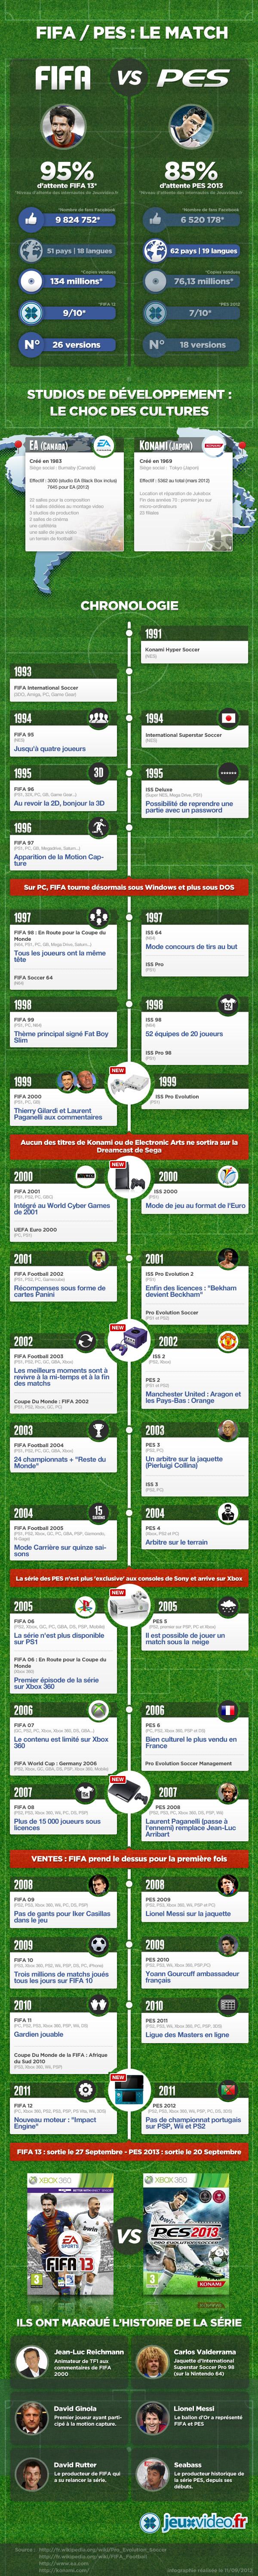 infographie jeux foot fifa vs pes